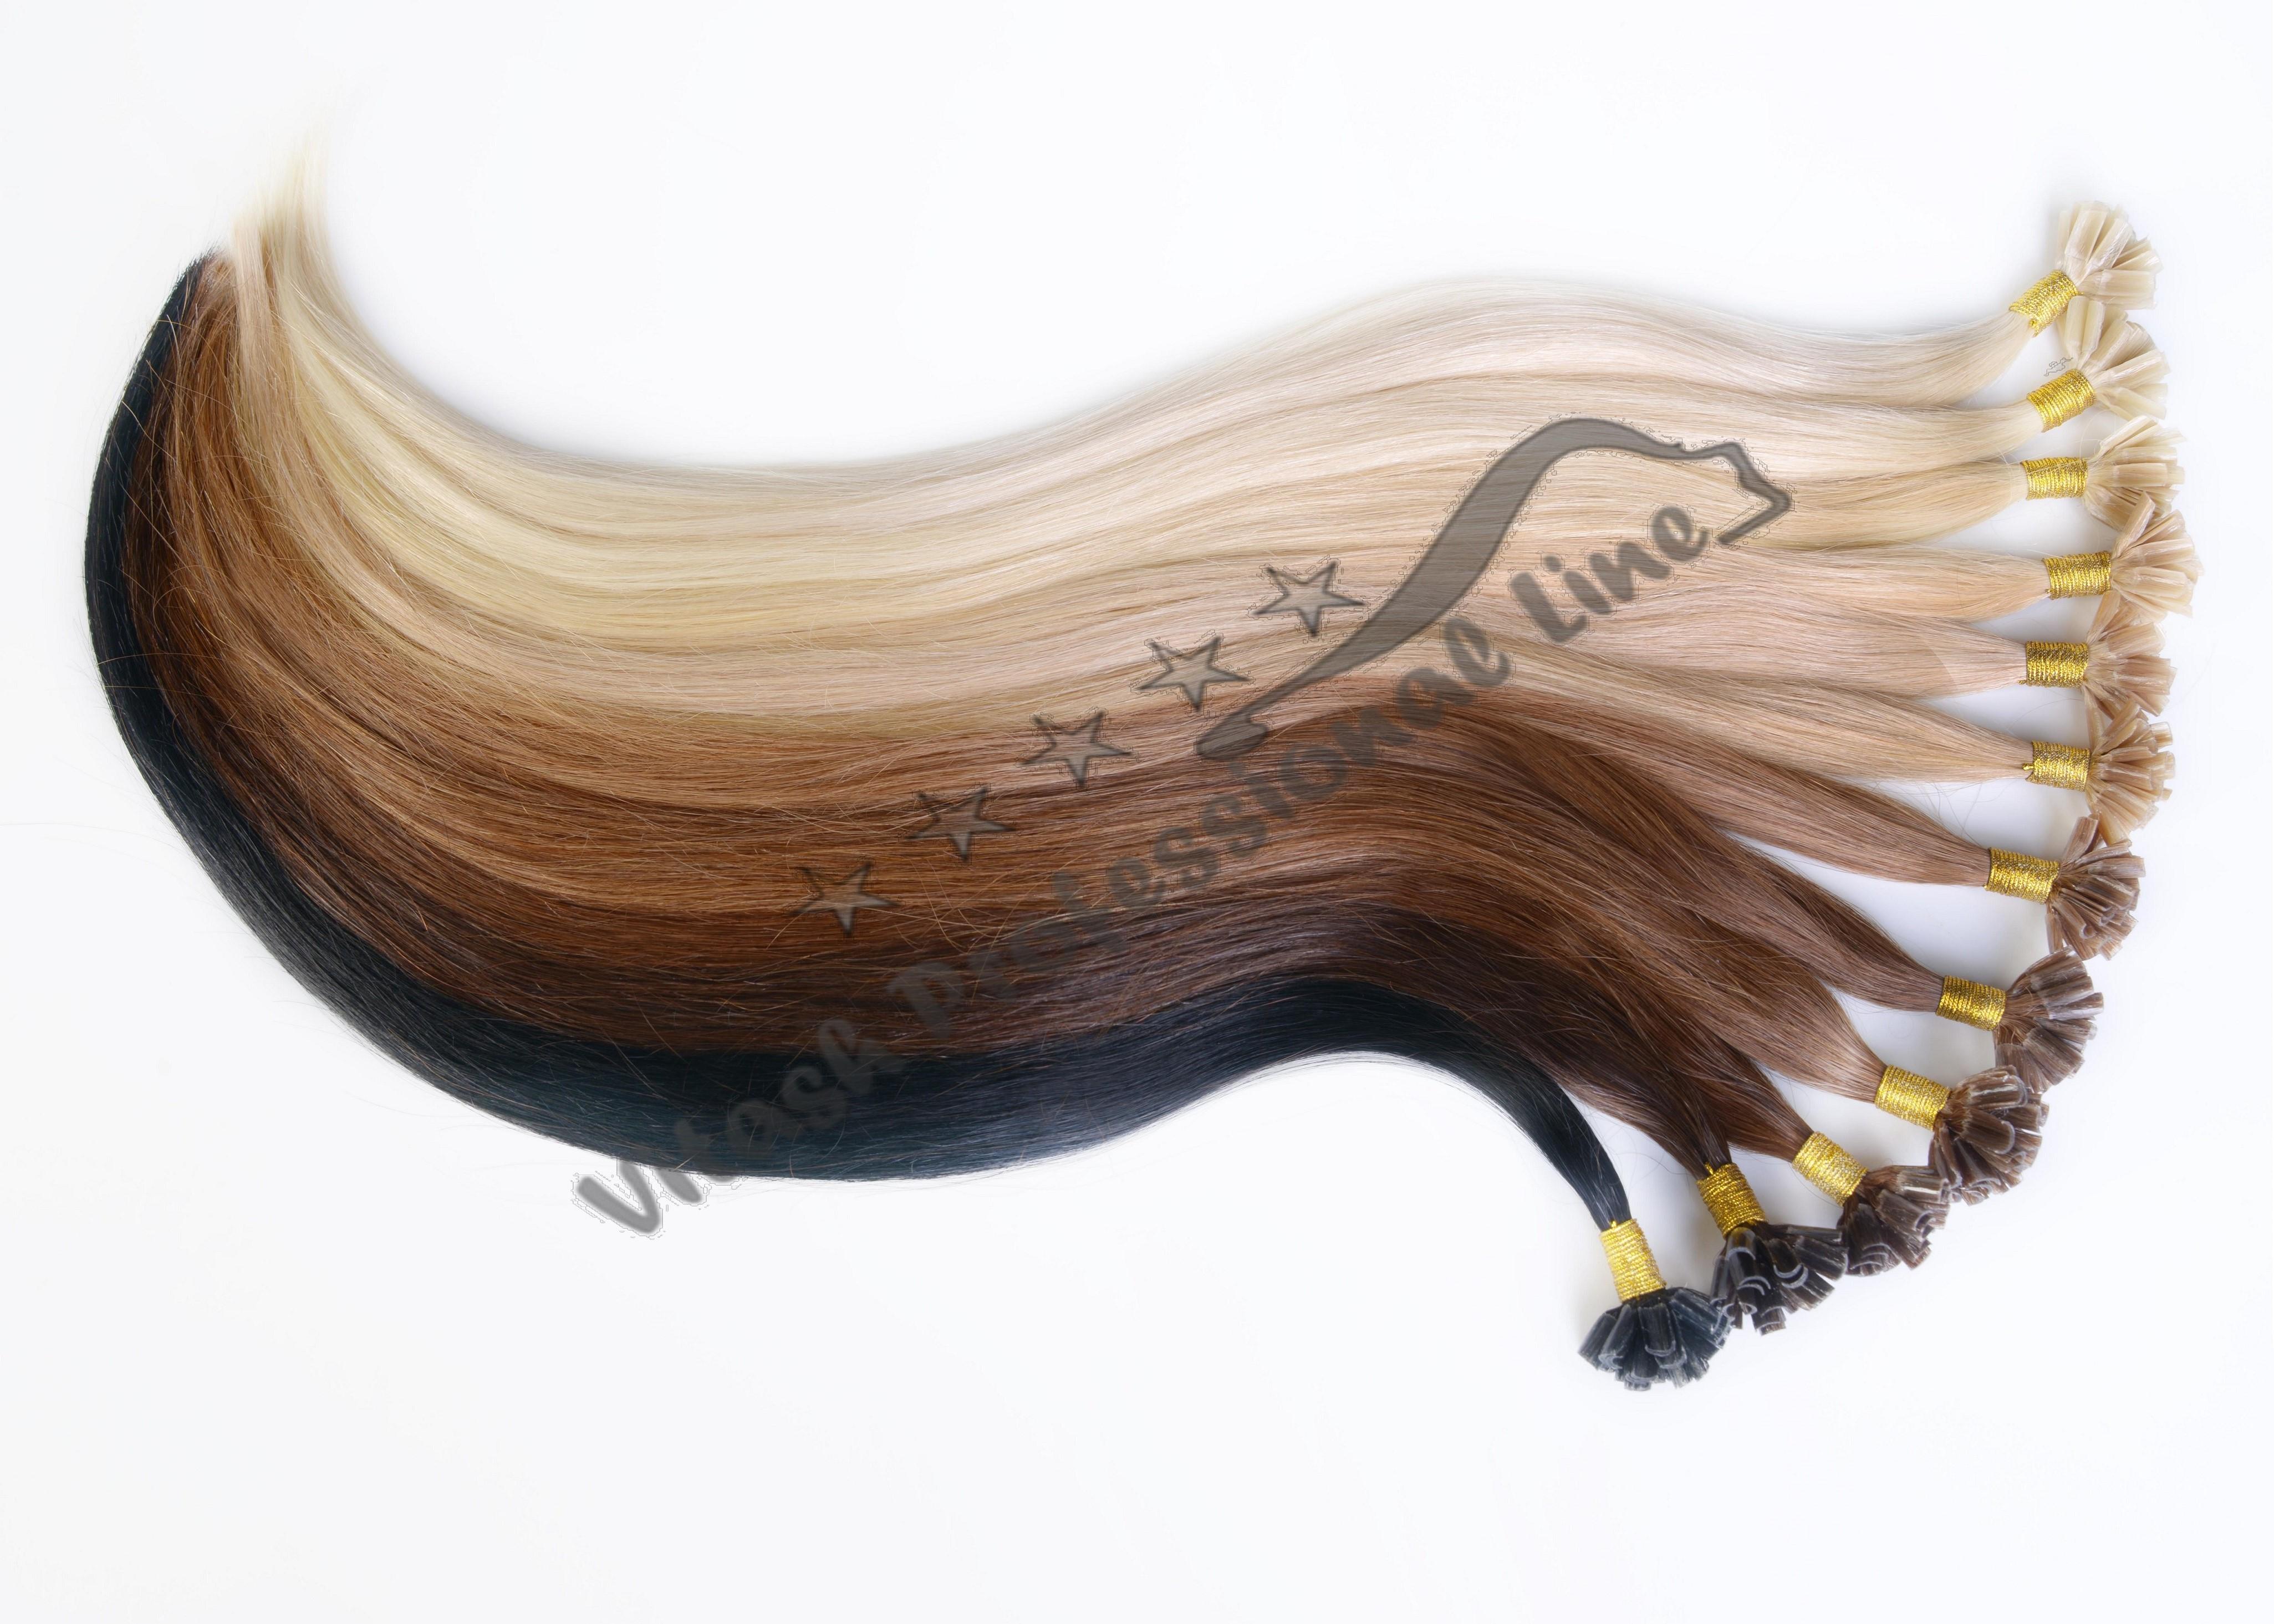 40 55 65 cm human hair echthaar extensions haarverl ngerung hart keratin bonding ebay. Black Bedroom Furniture Sets. Home Design Ideas